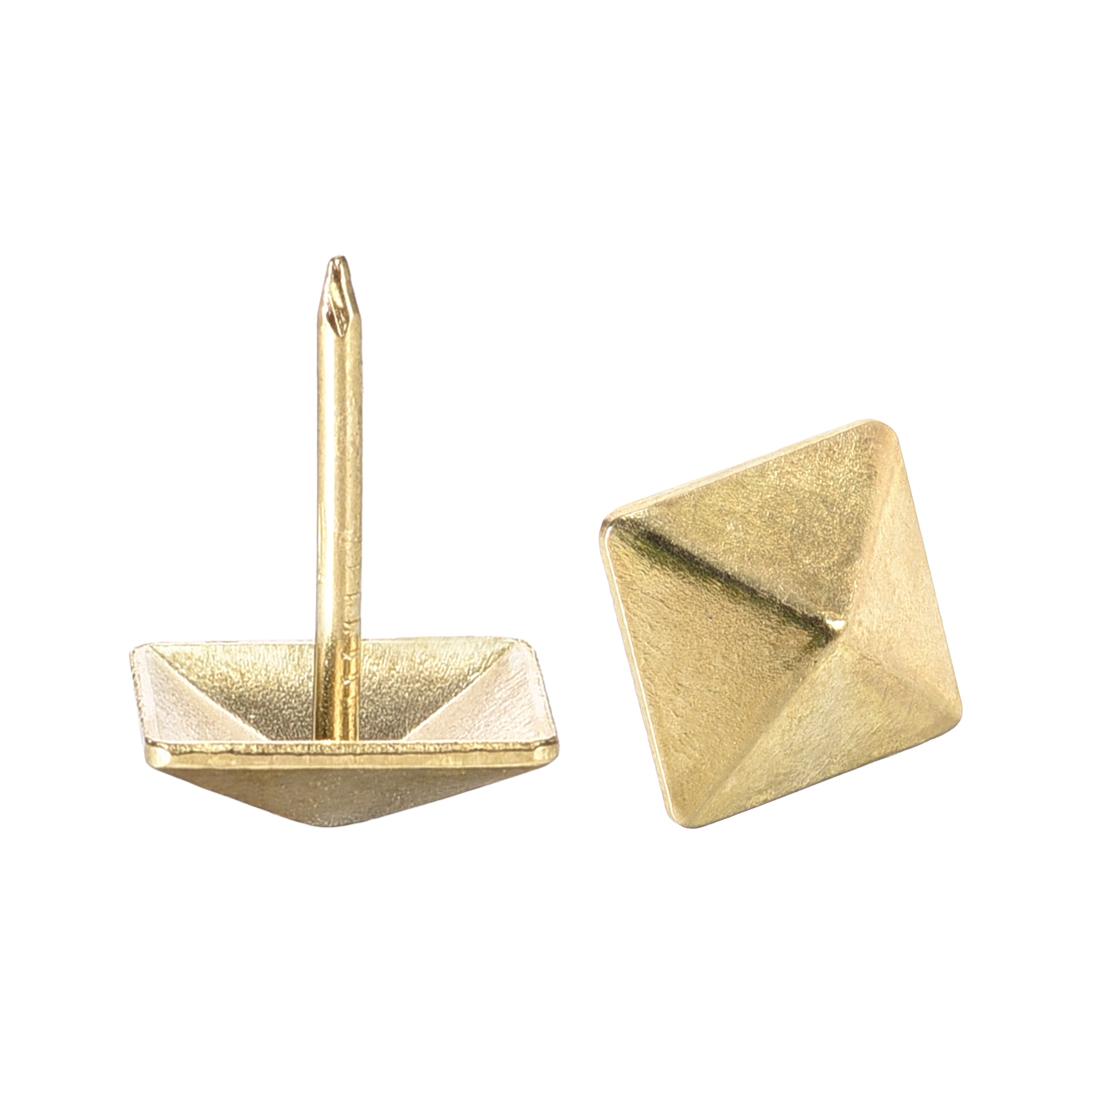 Upholstery Nails Tacks 12mm Square Head 17mm Height Nails Pins Gold Tone 80 Pcs